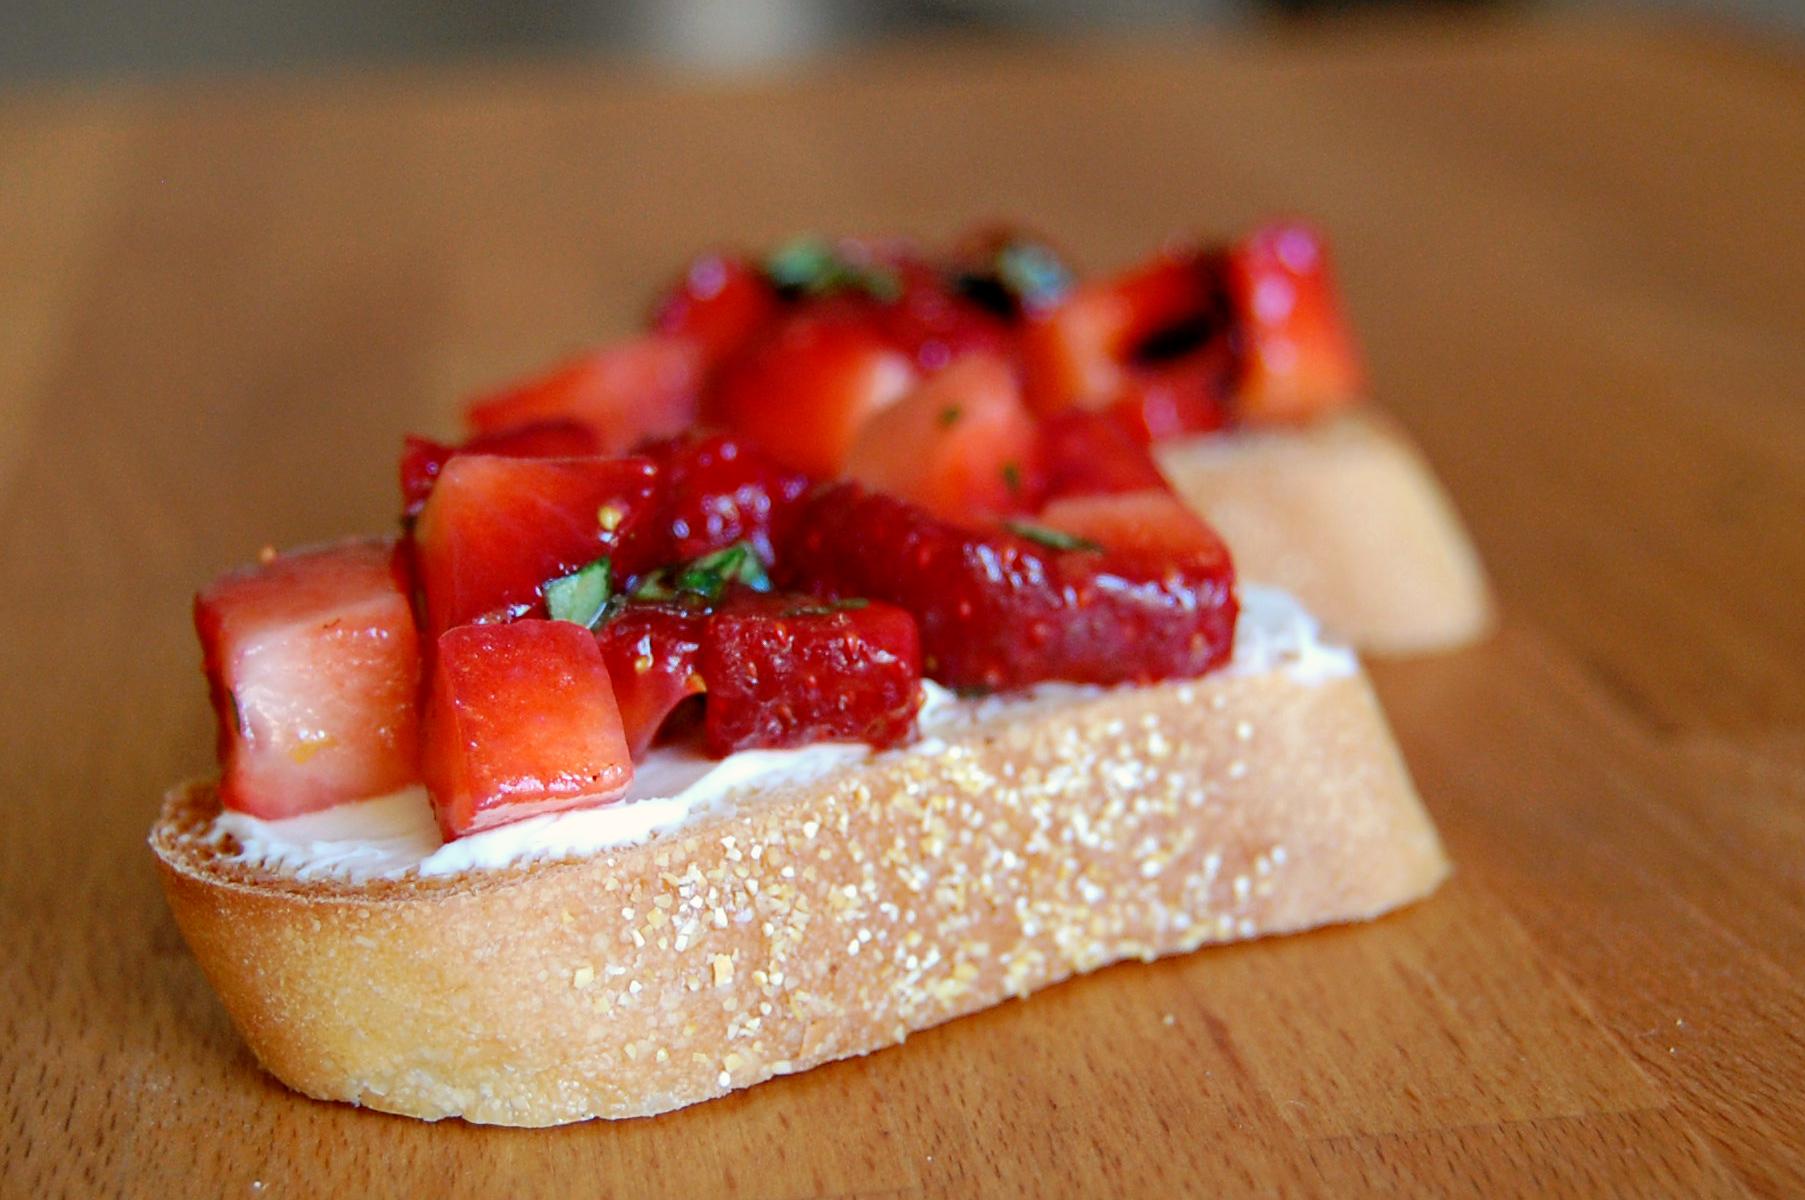 bruschetta strawberry 9816